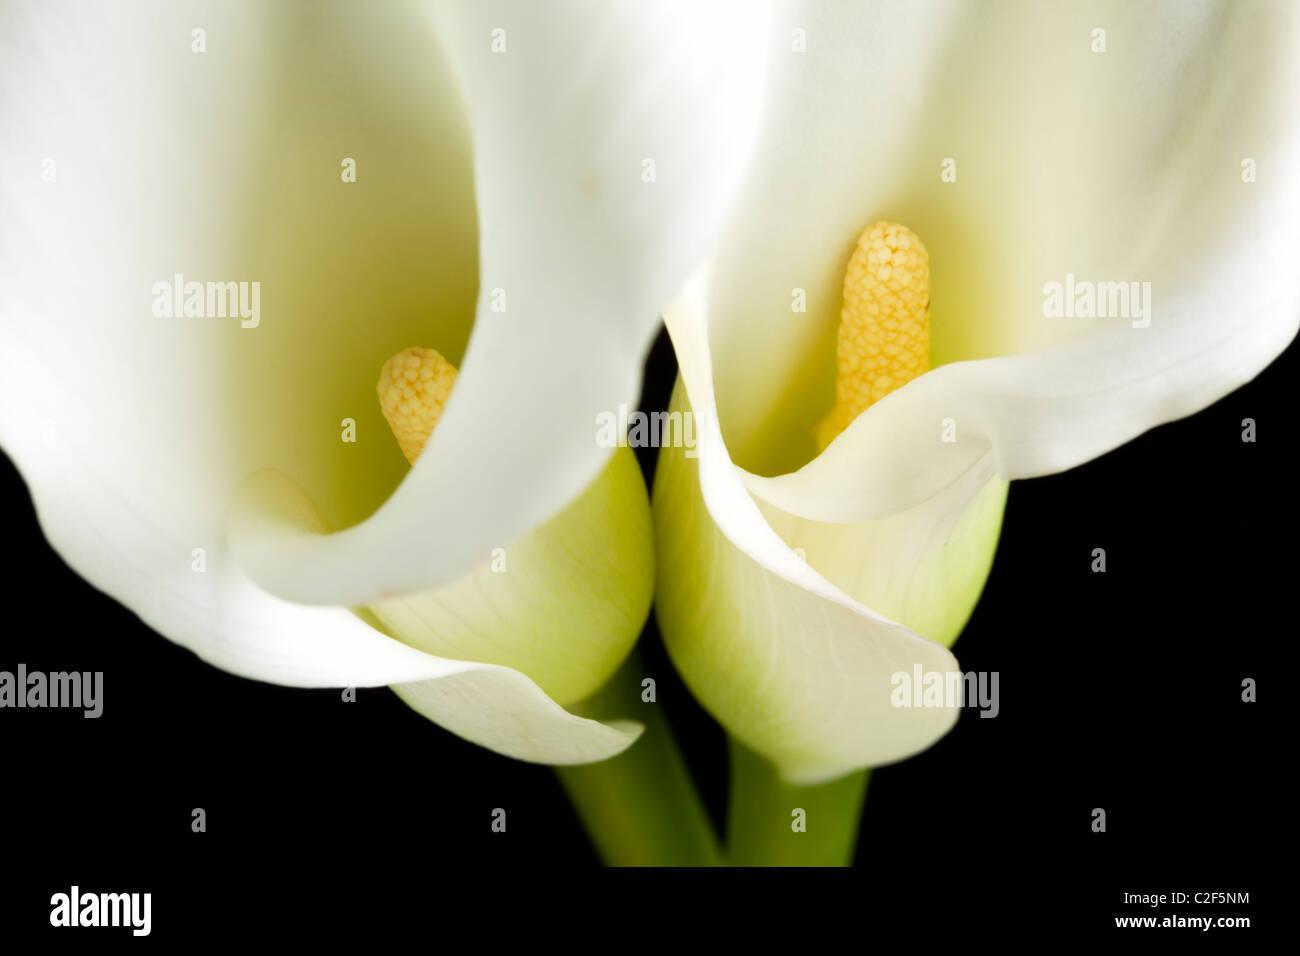 Closeup Of Two White Calla Lily Blossoms Black Background Stock